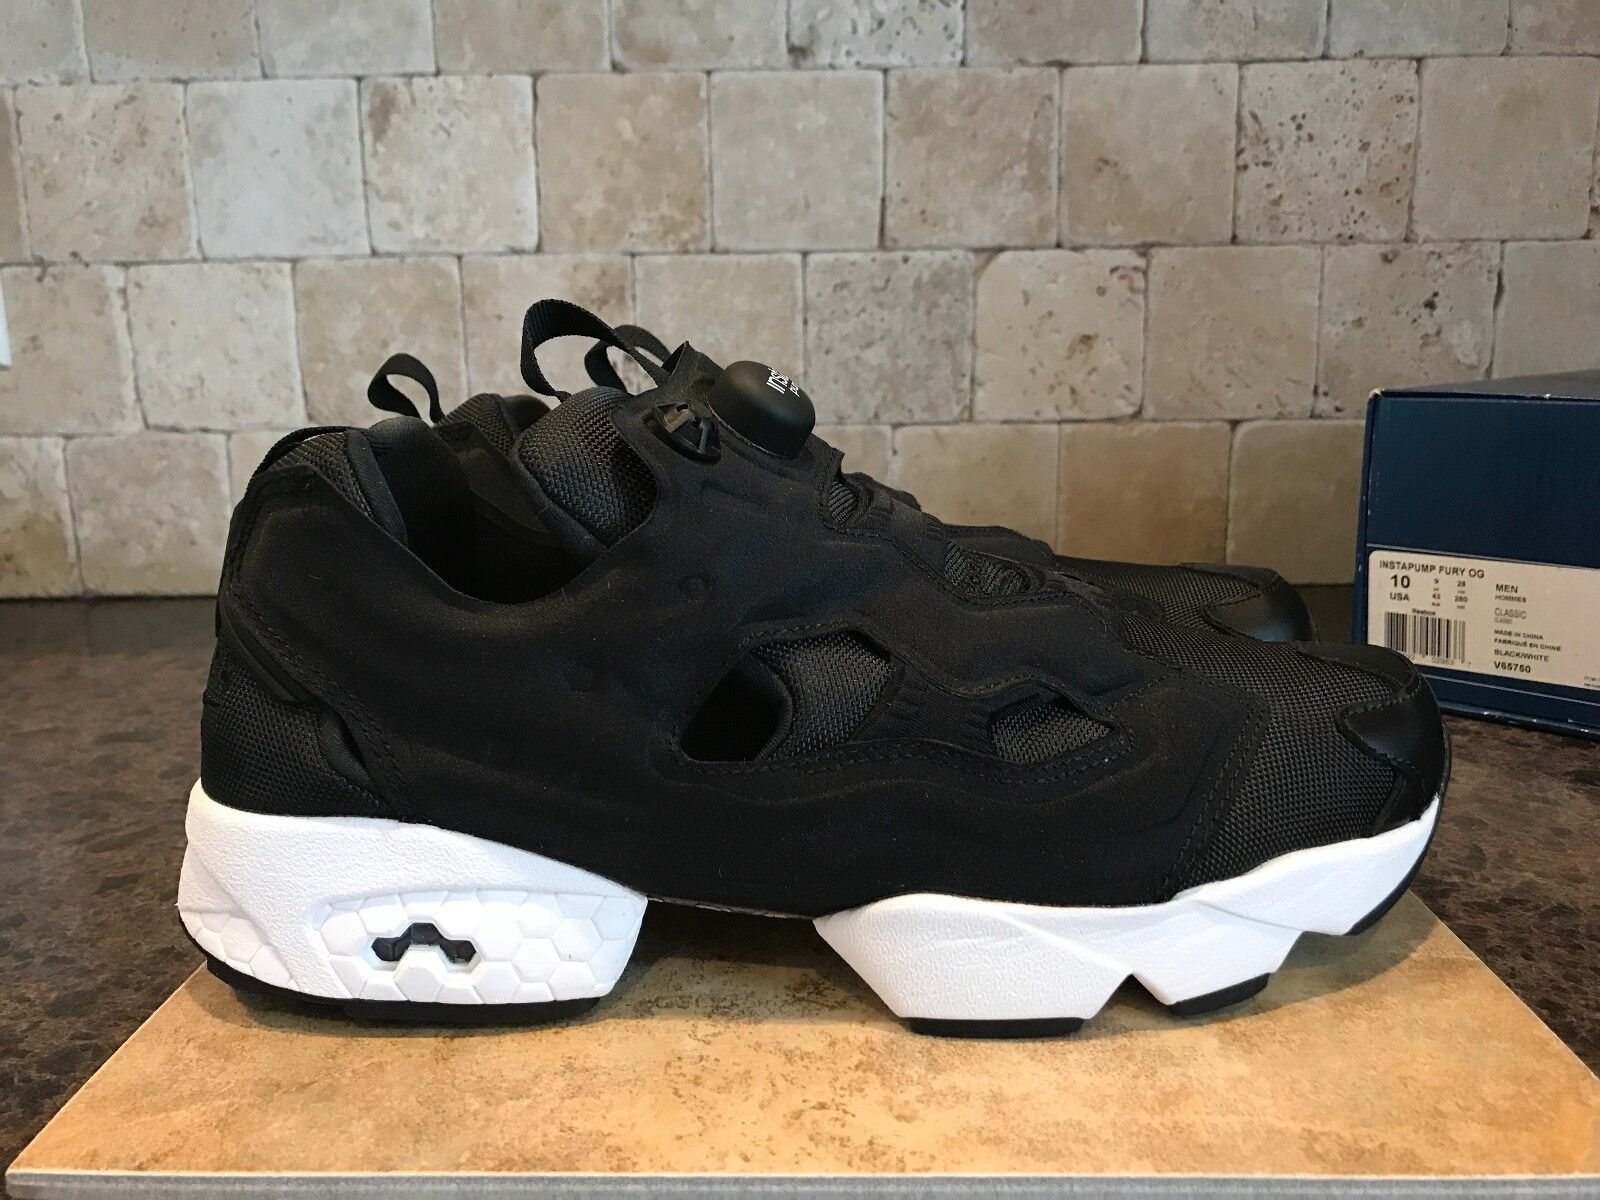 Reebok Instapump FURY OG Zapatos para hombre V65750 Negro-blancoo Slip On